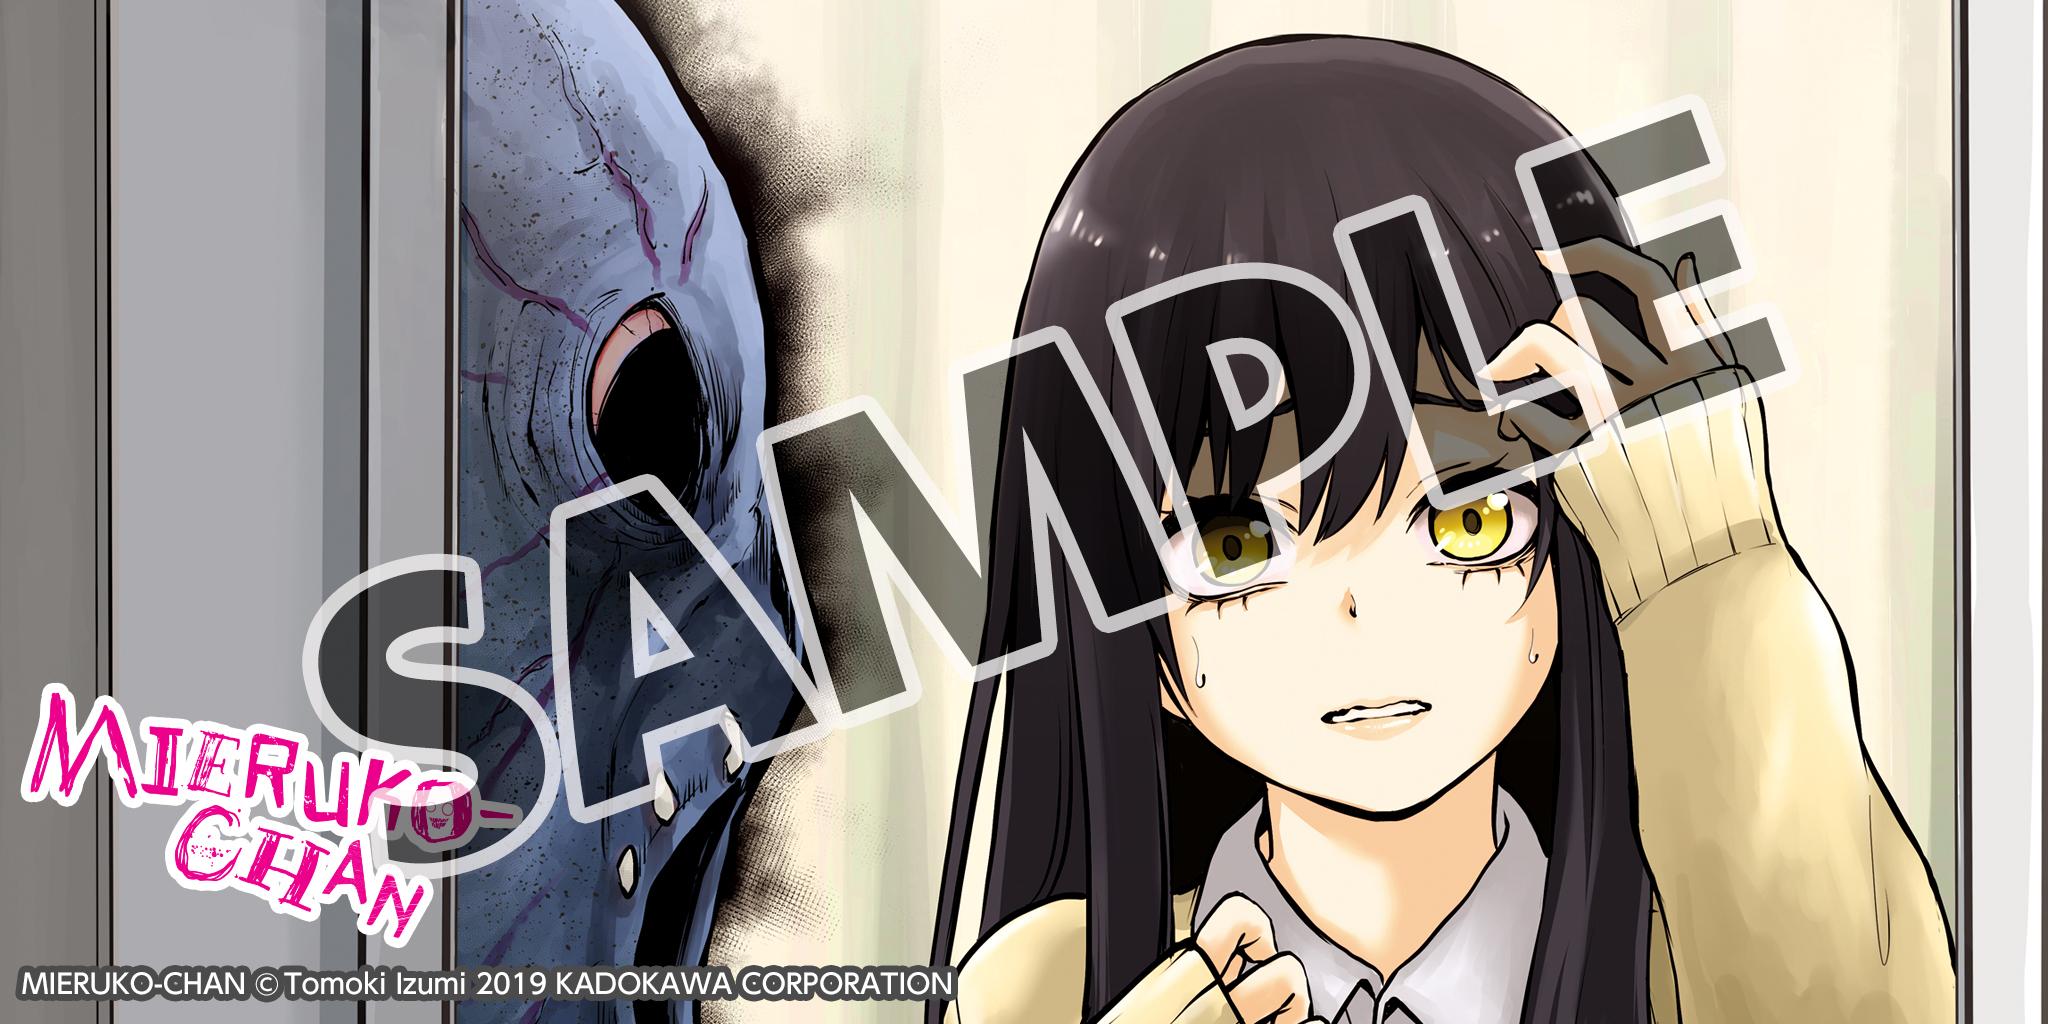 [Bookshelf Cover Image] Mieruko-chan, Vol. 1